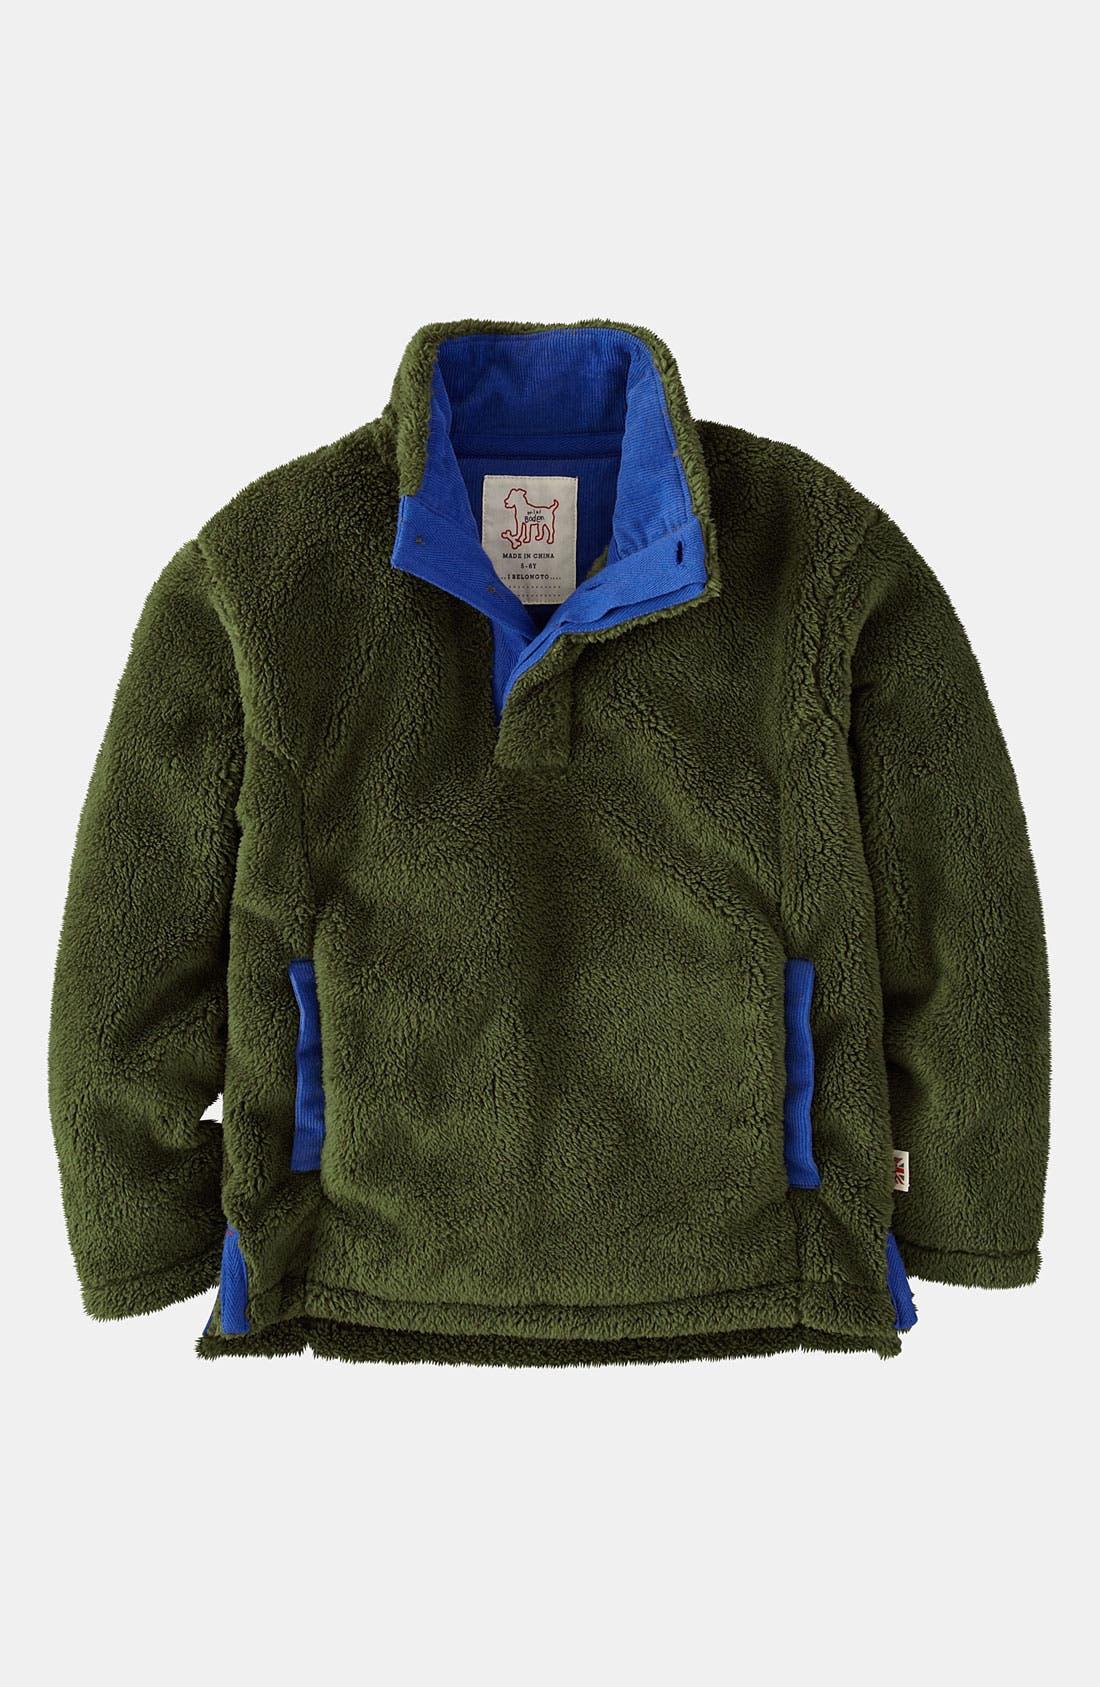 Alternate Image 1 Selected - Mini Boden Half Placket Fleece Jacket (Toddler)